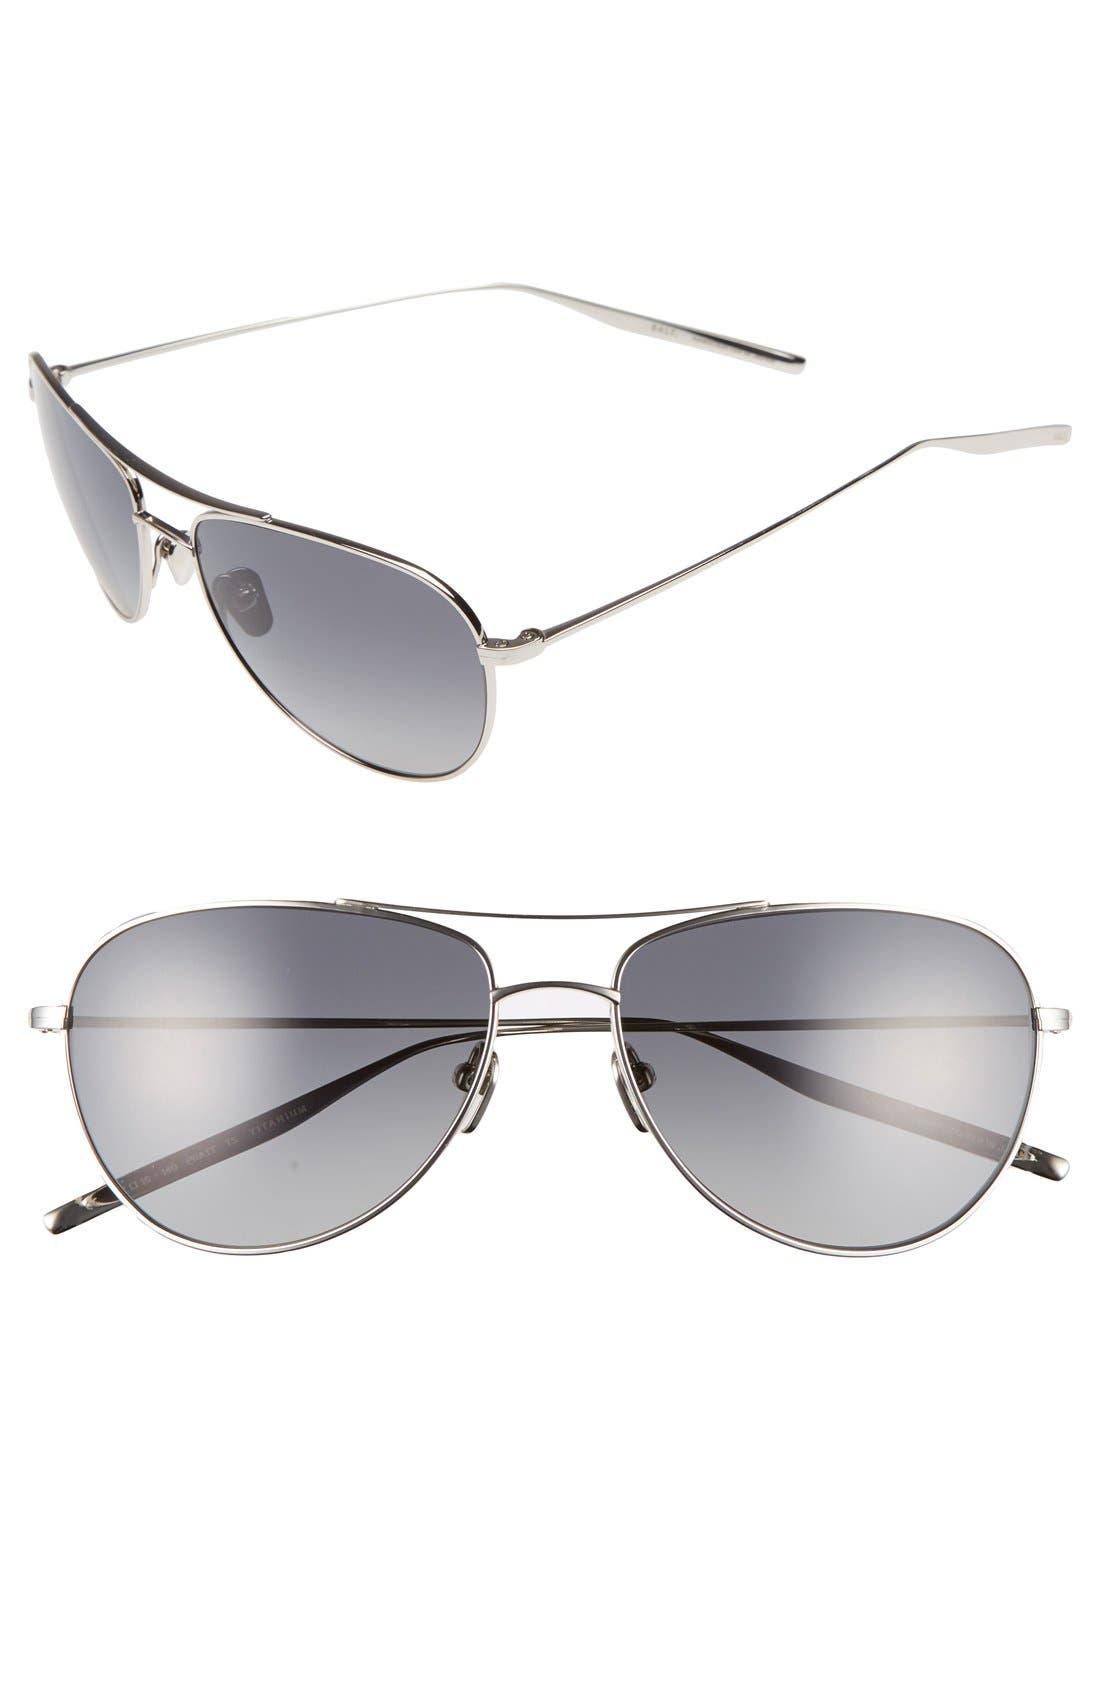 'Pratt' 57mm Aviator Sunglasses,                             Main thumbnail 1, color,                             040